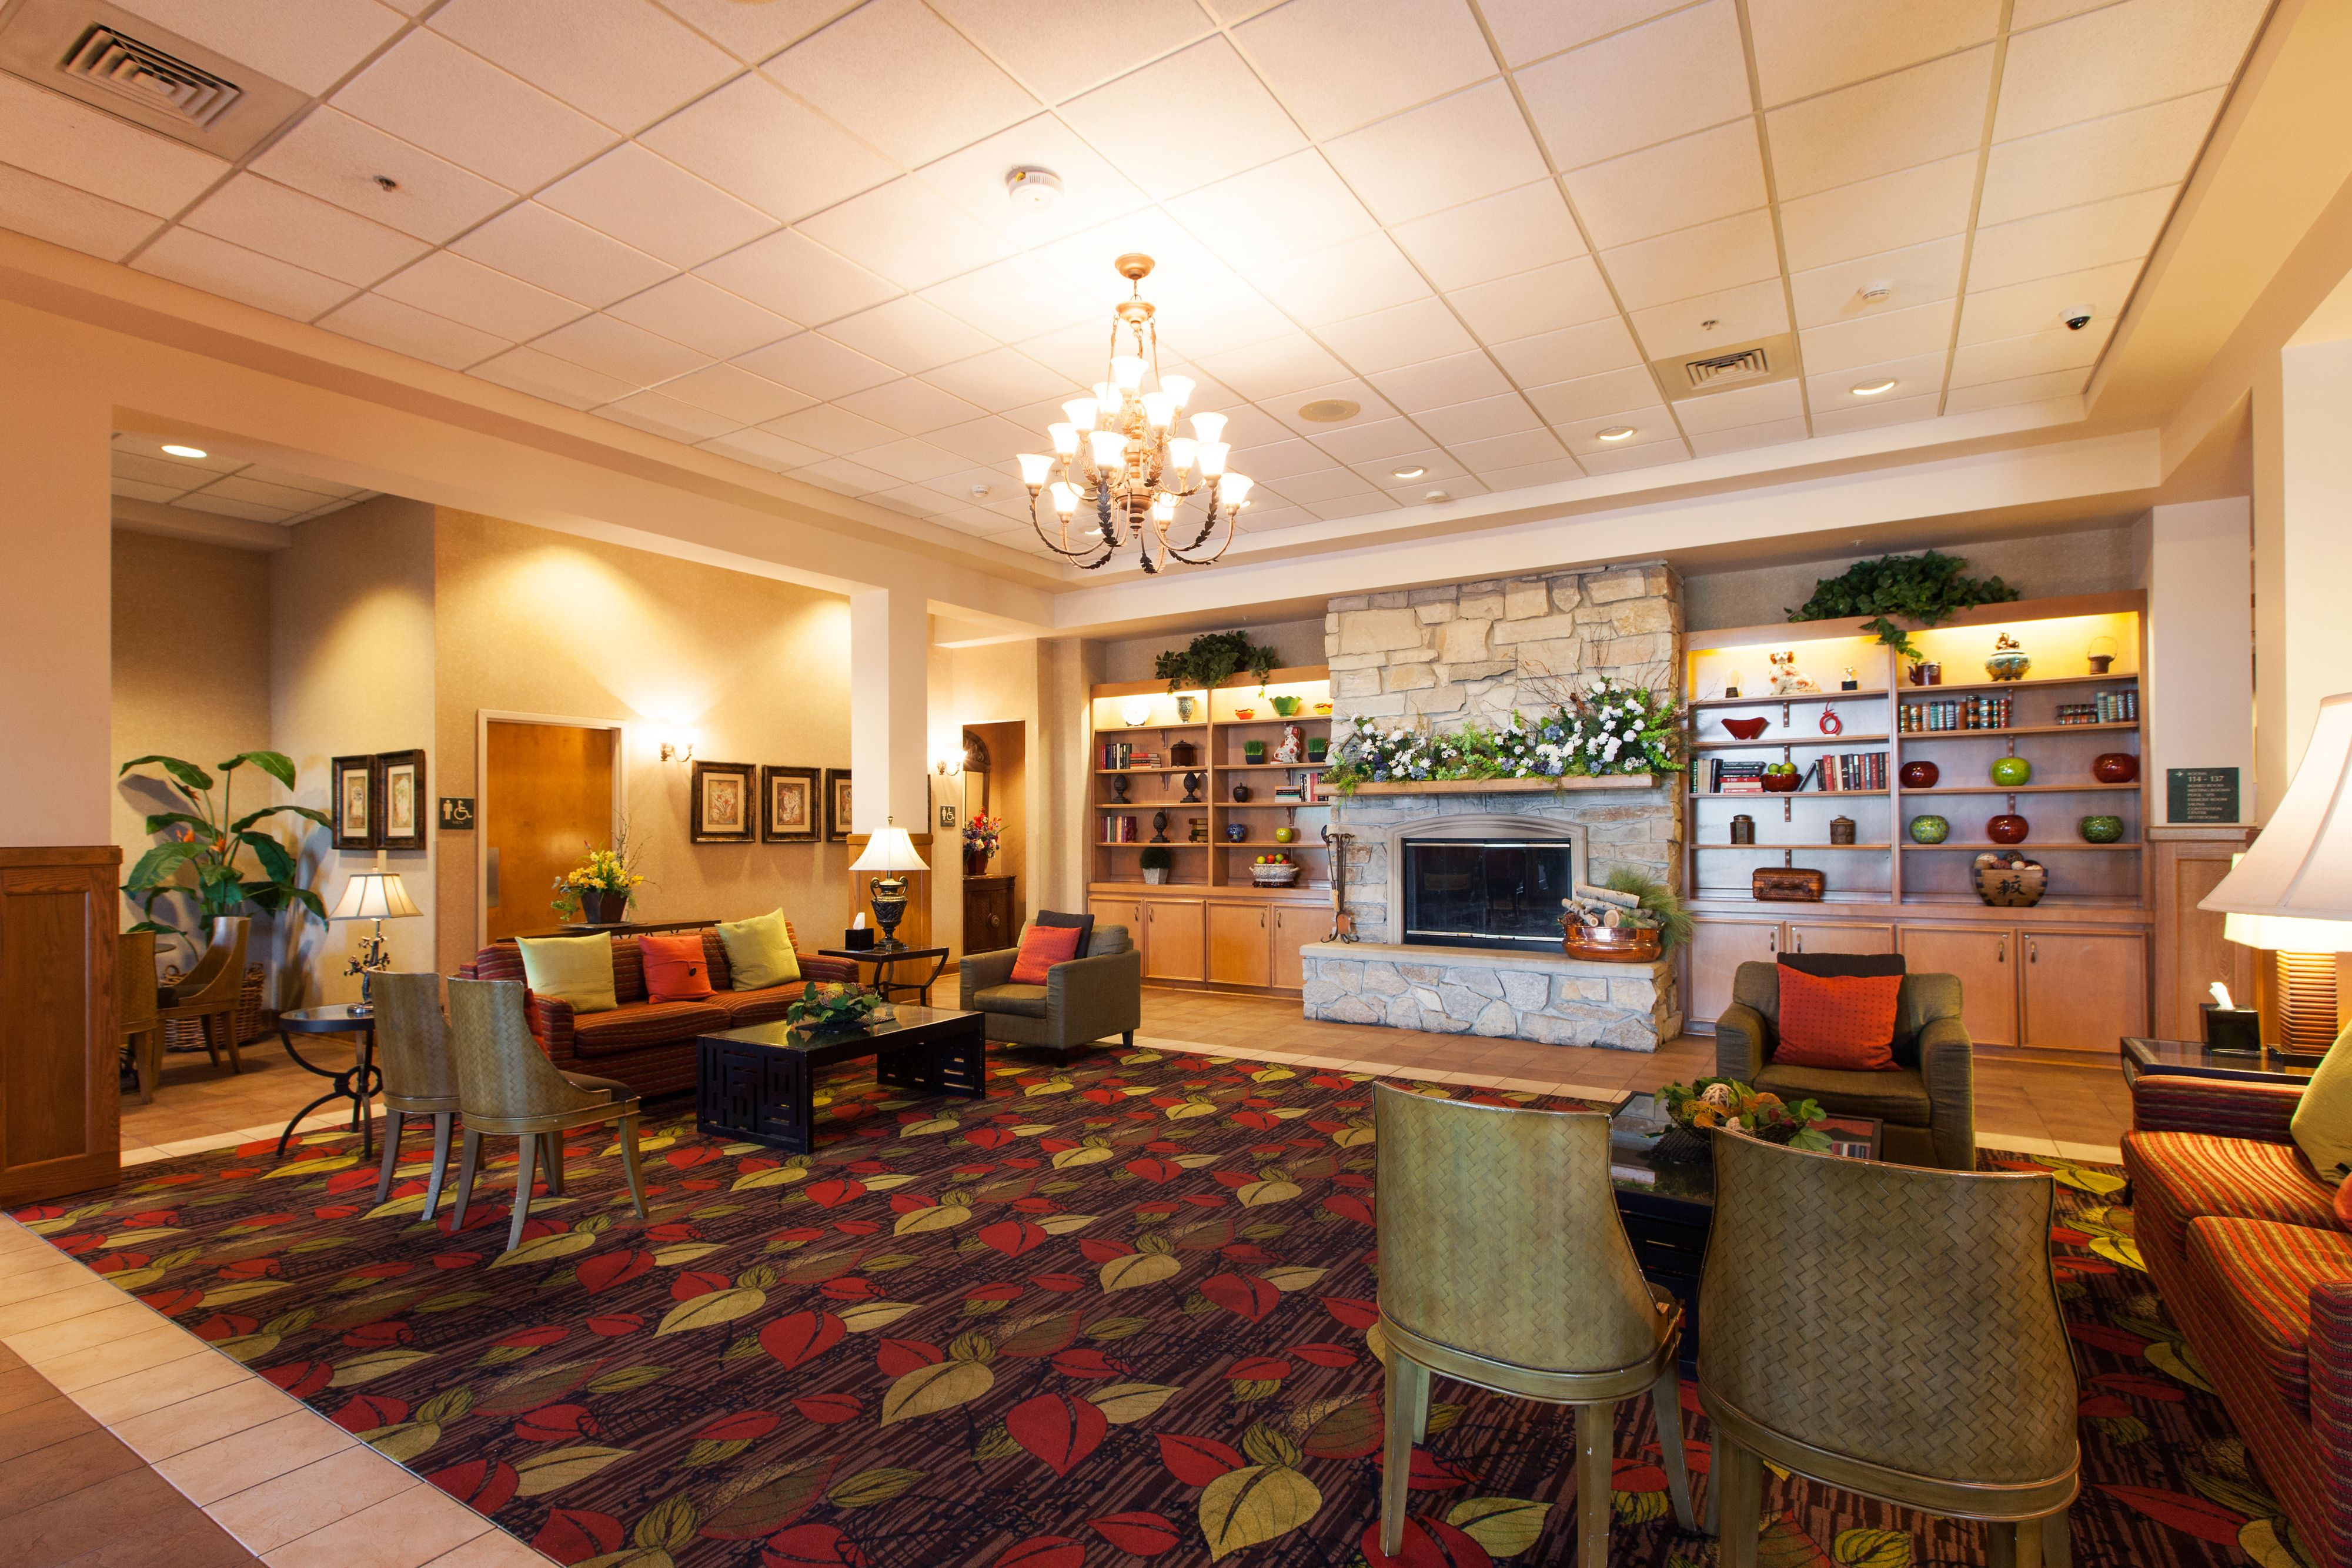 Holiday Inn Chicago-Tinley Park-Conv Ctr image 4